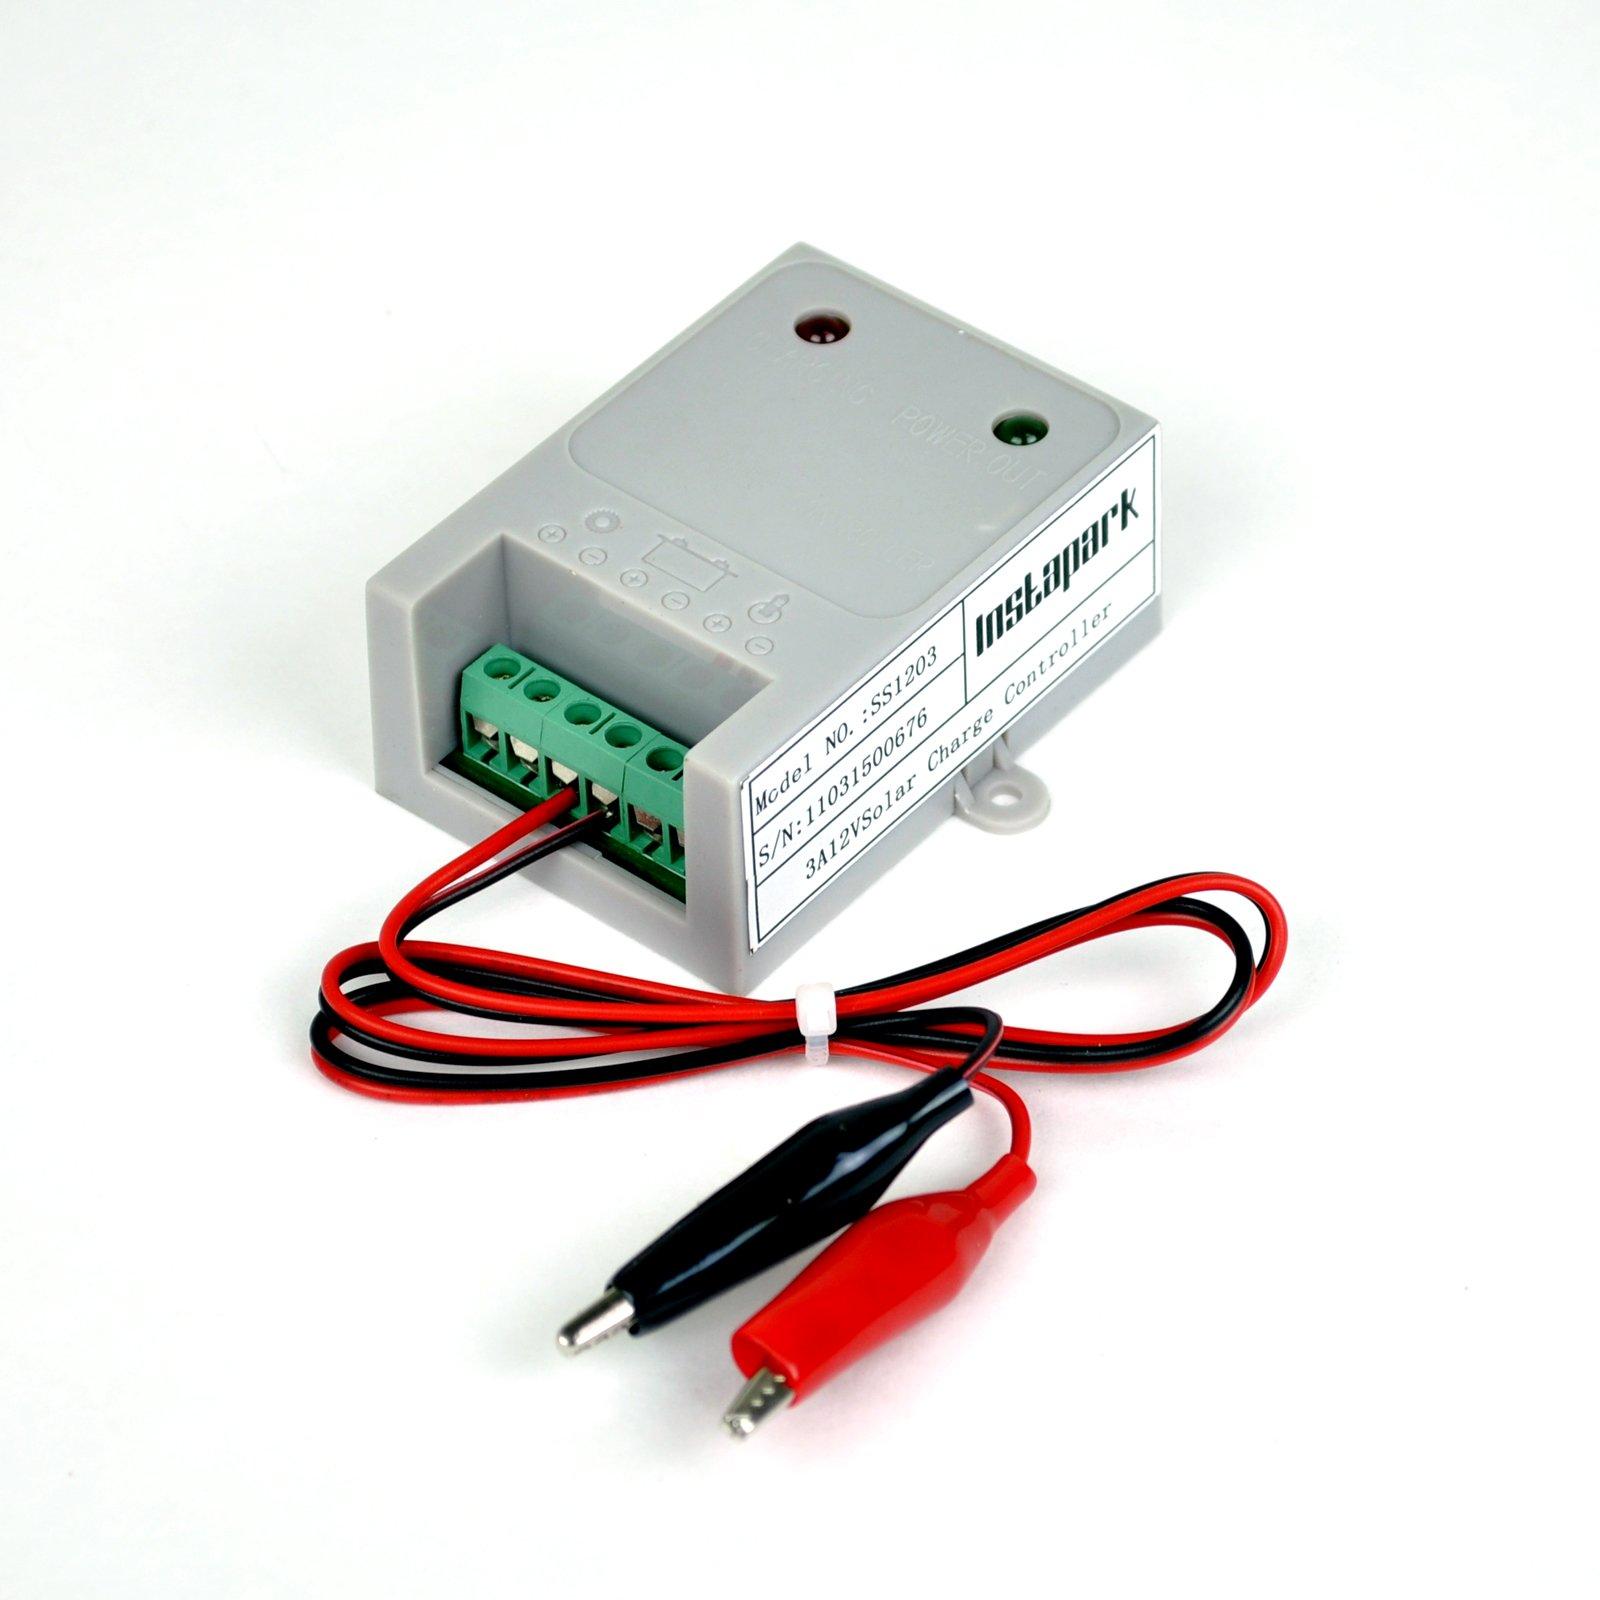 Instapark SS1203 3Amp Solar Power Charge Controller, 45 Watt at 12V